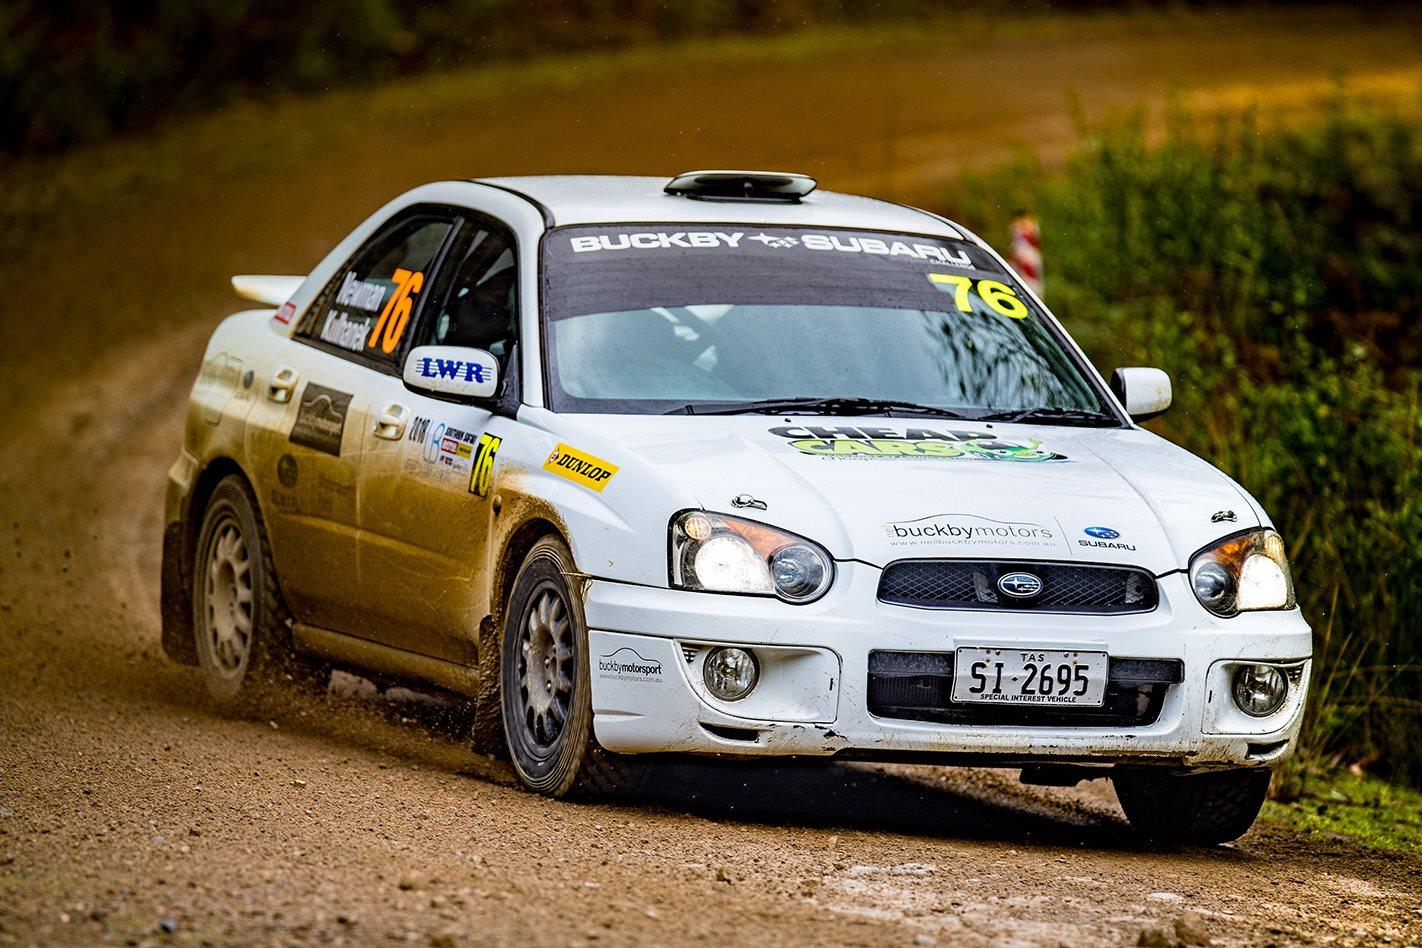 Subaru Impreza RS action